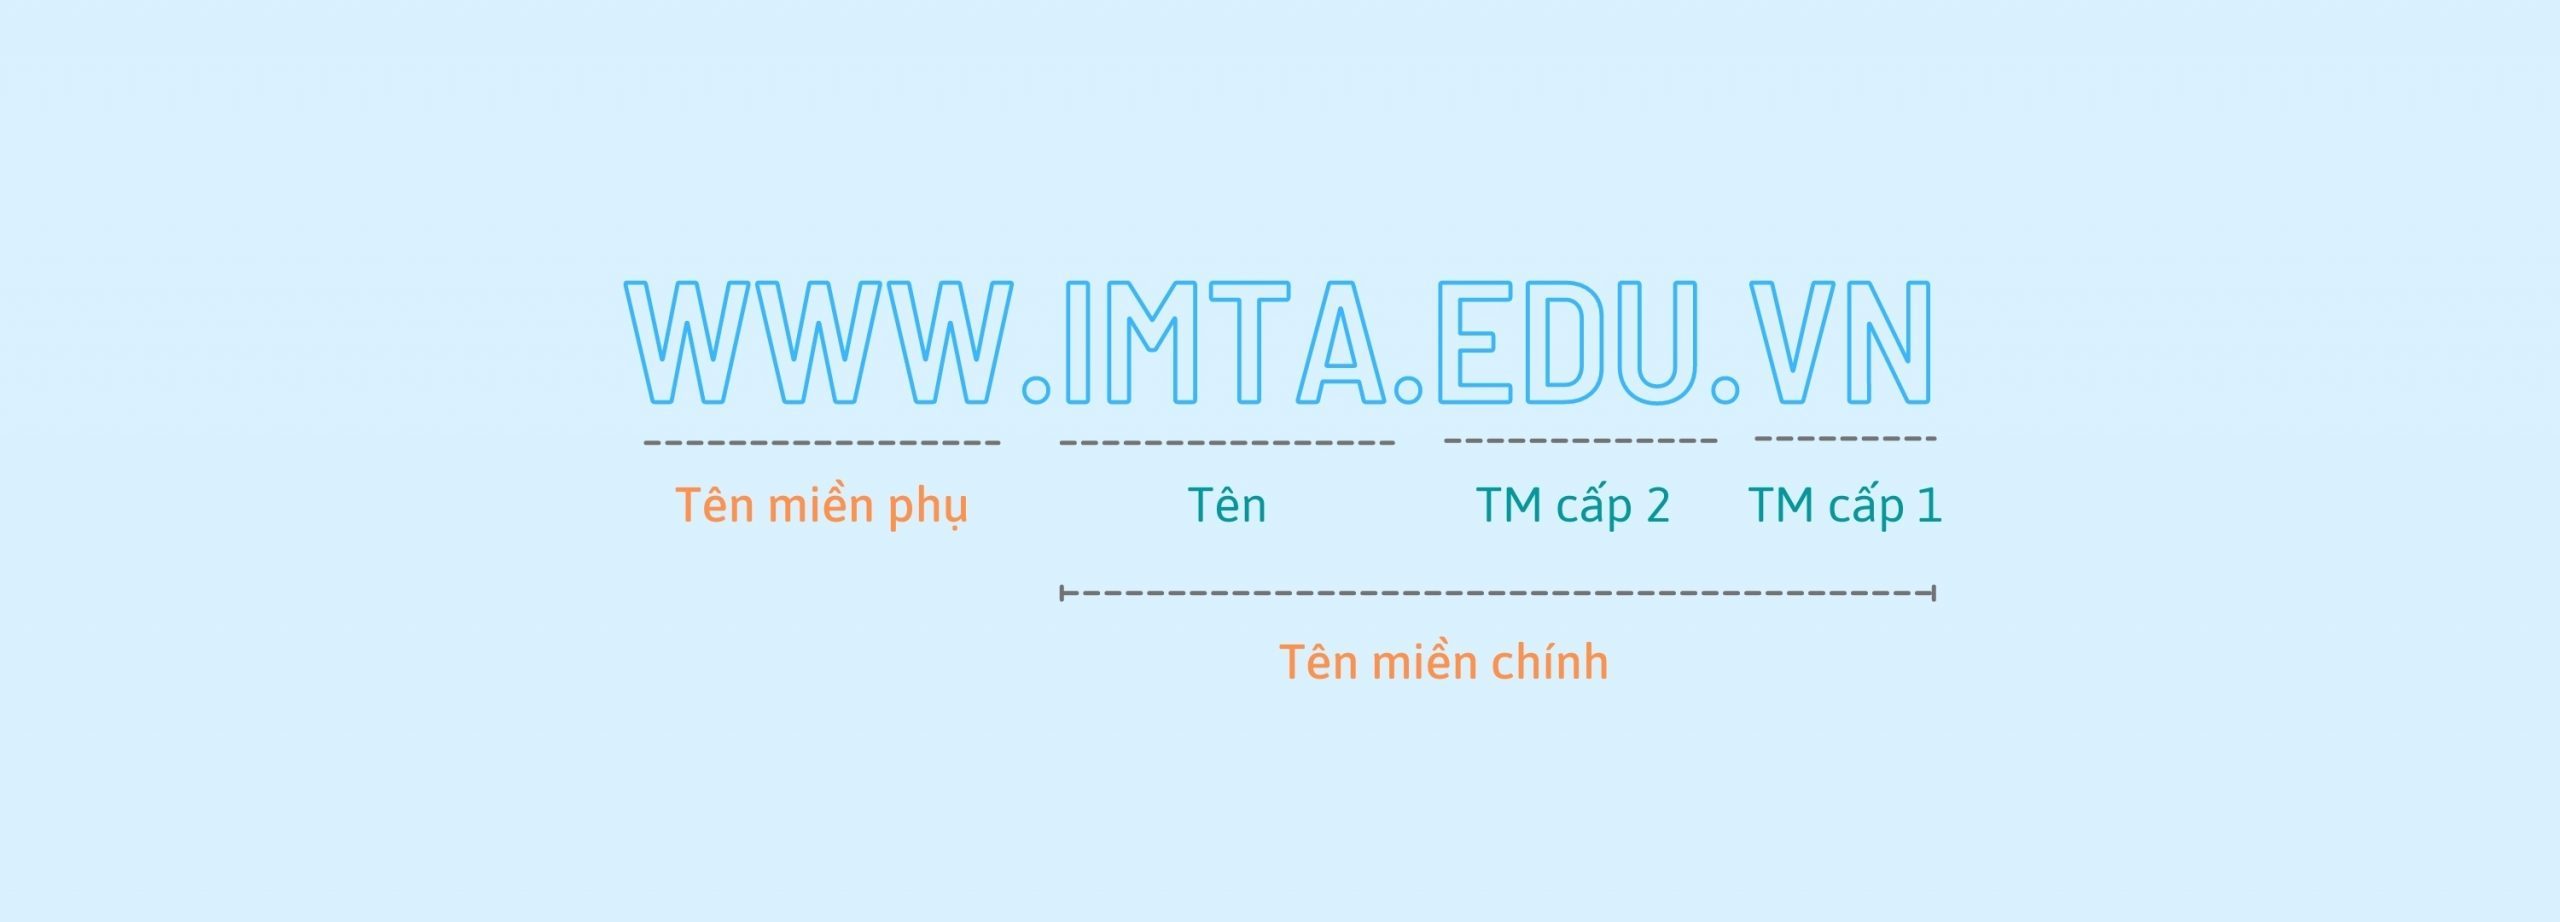 Cấu trúc của domain (tên miền)